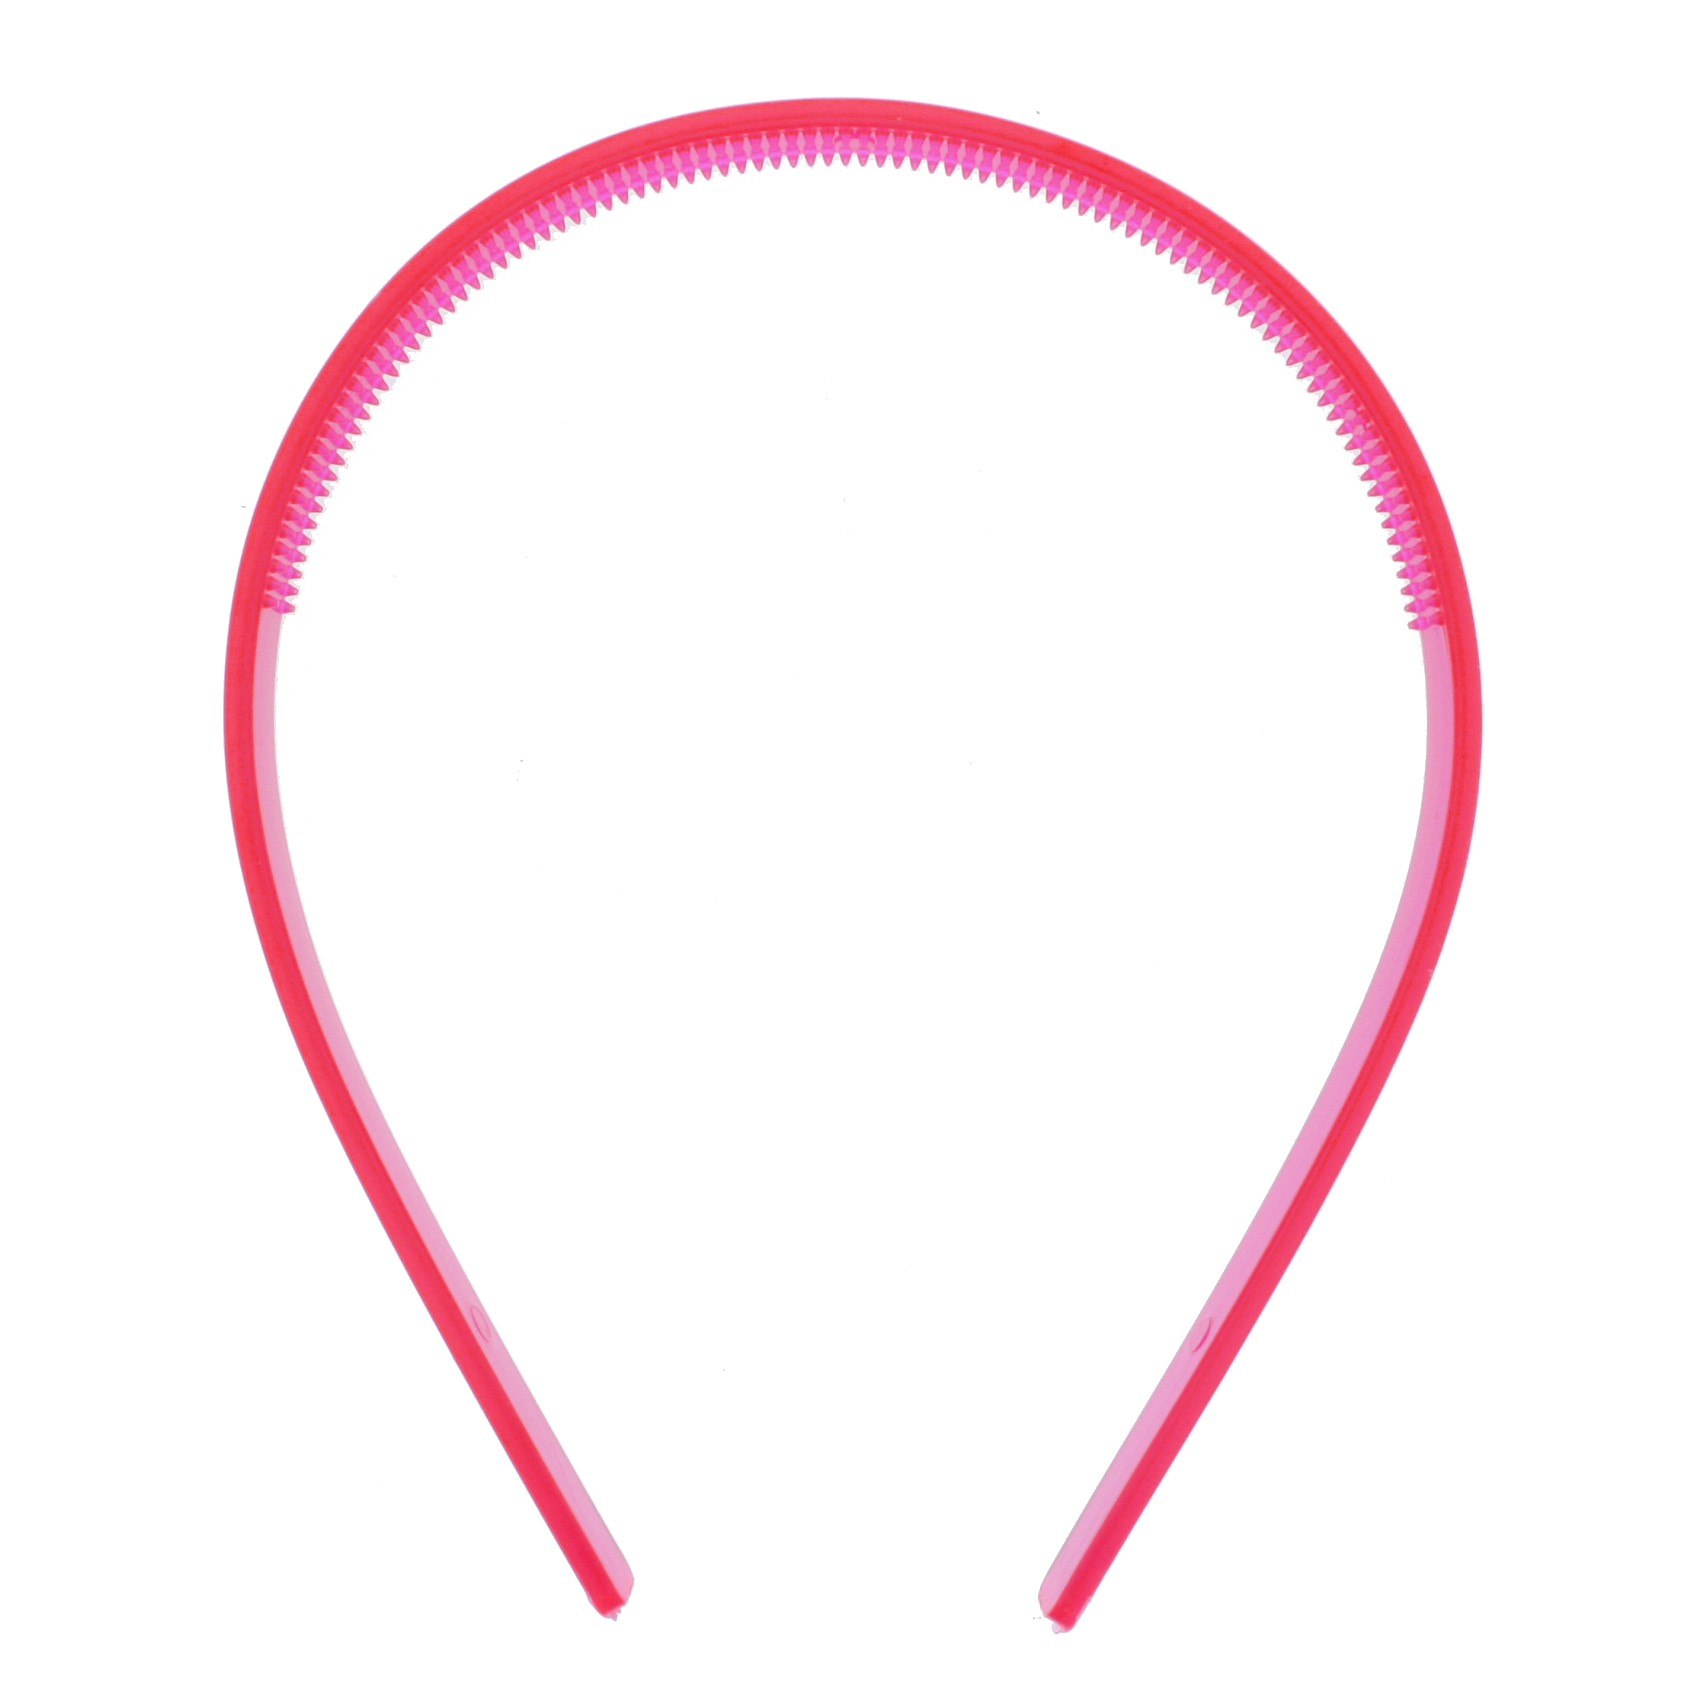 Tiara Plástica com Dentinhos - Pink Neon - 10mm  - Stéphanie Bijoux® - Peças para Bijuterias e Artesanato